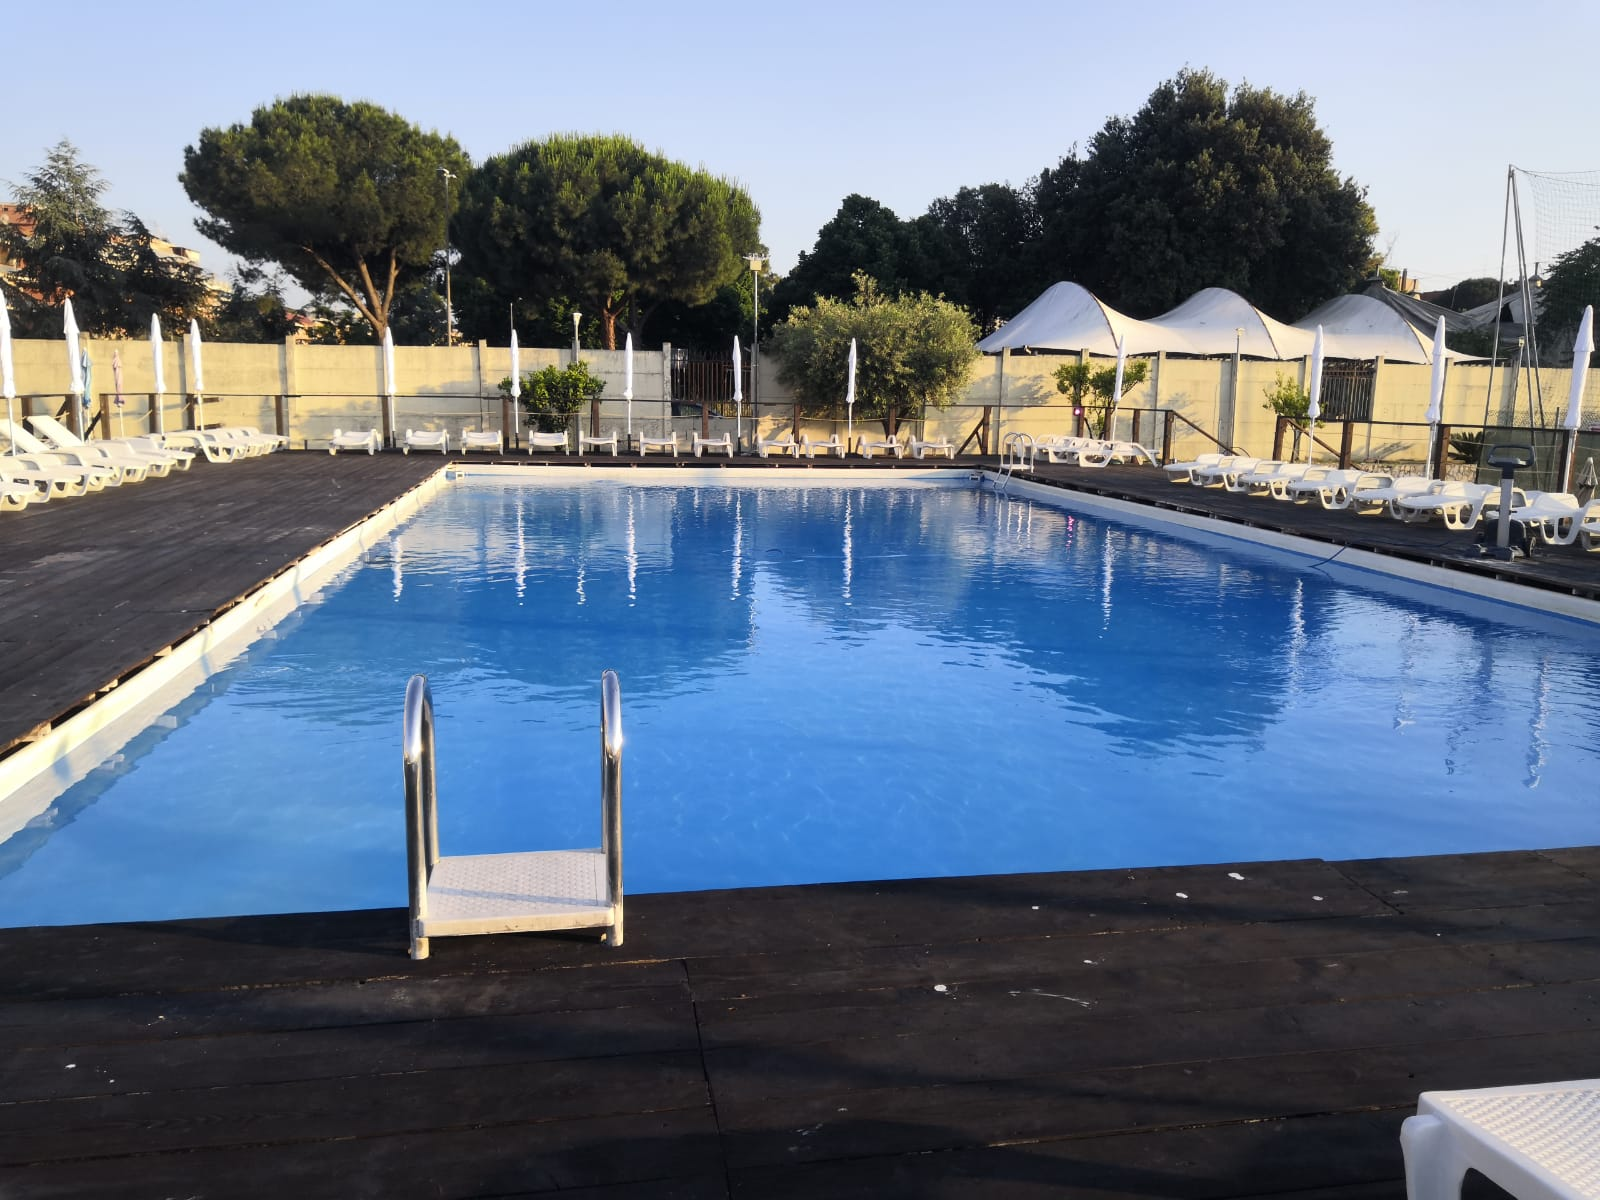 centocellefc piscina 2019 - 16